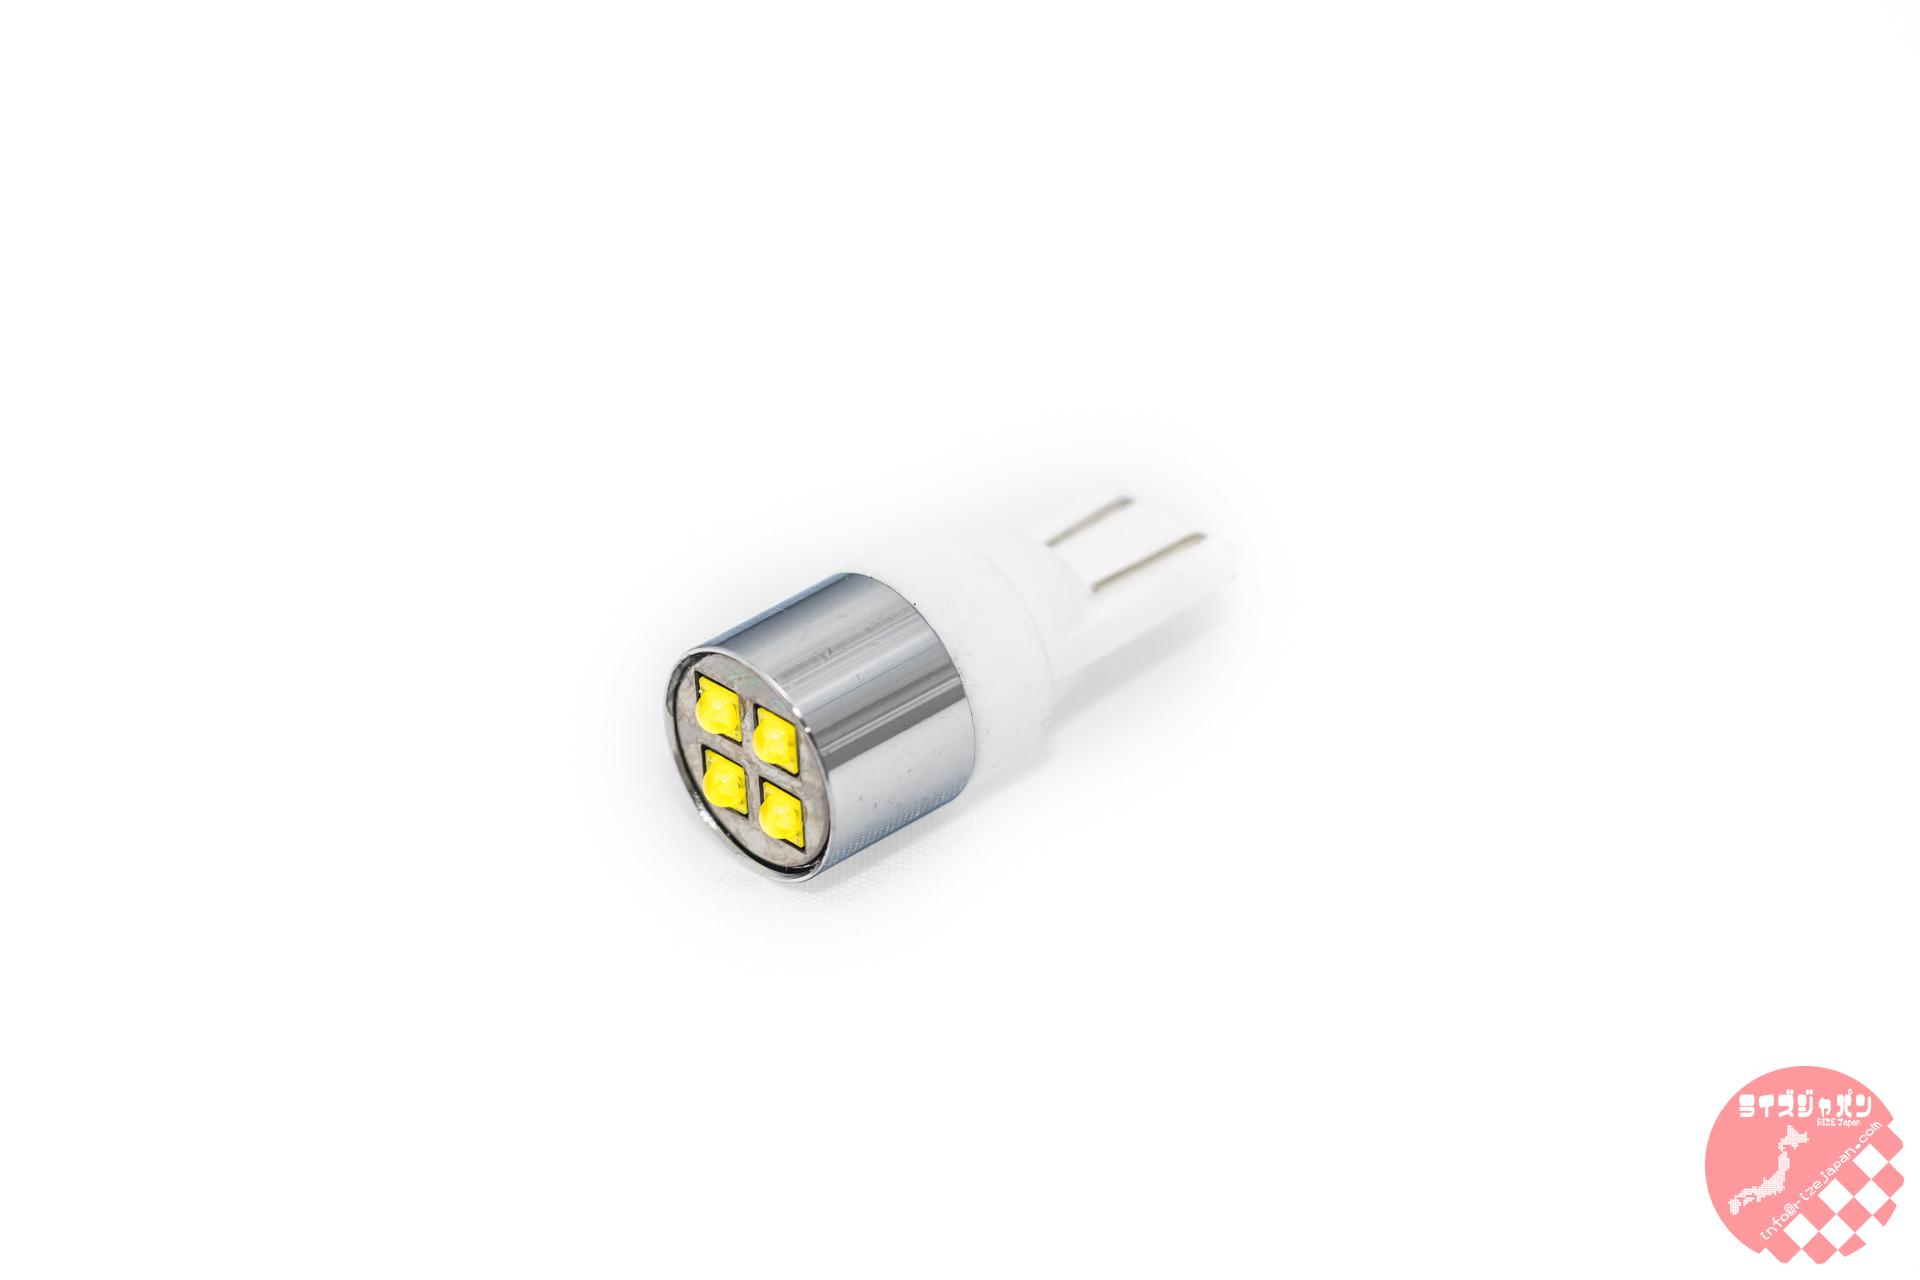 T10 LEDバルブ 20Wモデル / T10 LED bulb 20W model